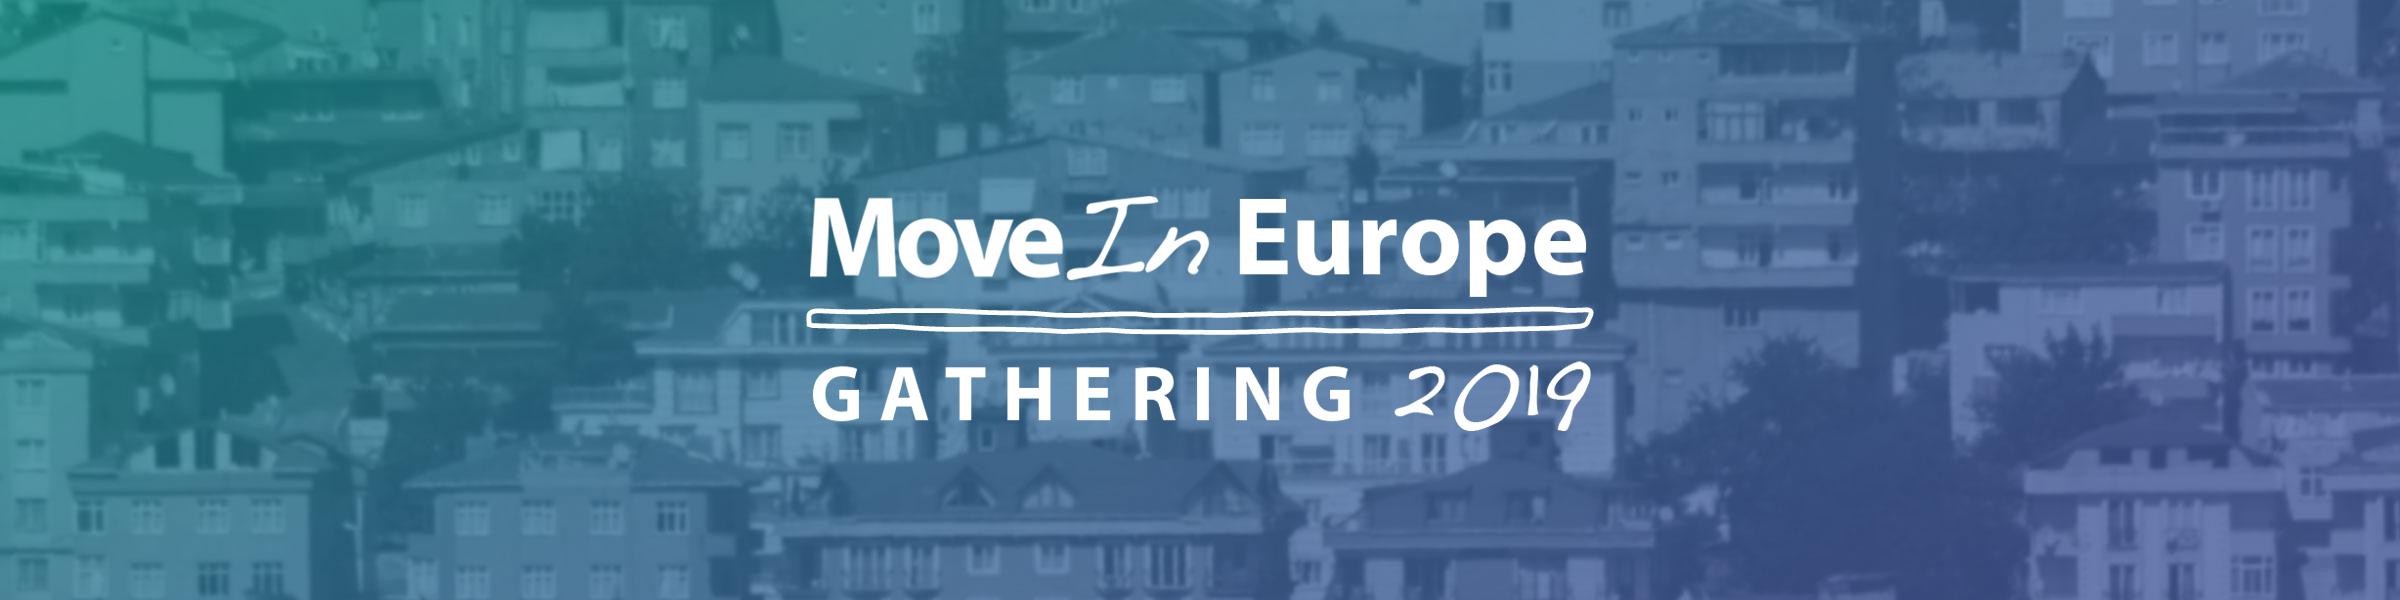 MI Europe thin banner 1.jpg